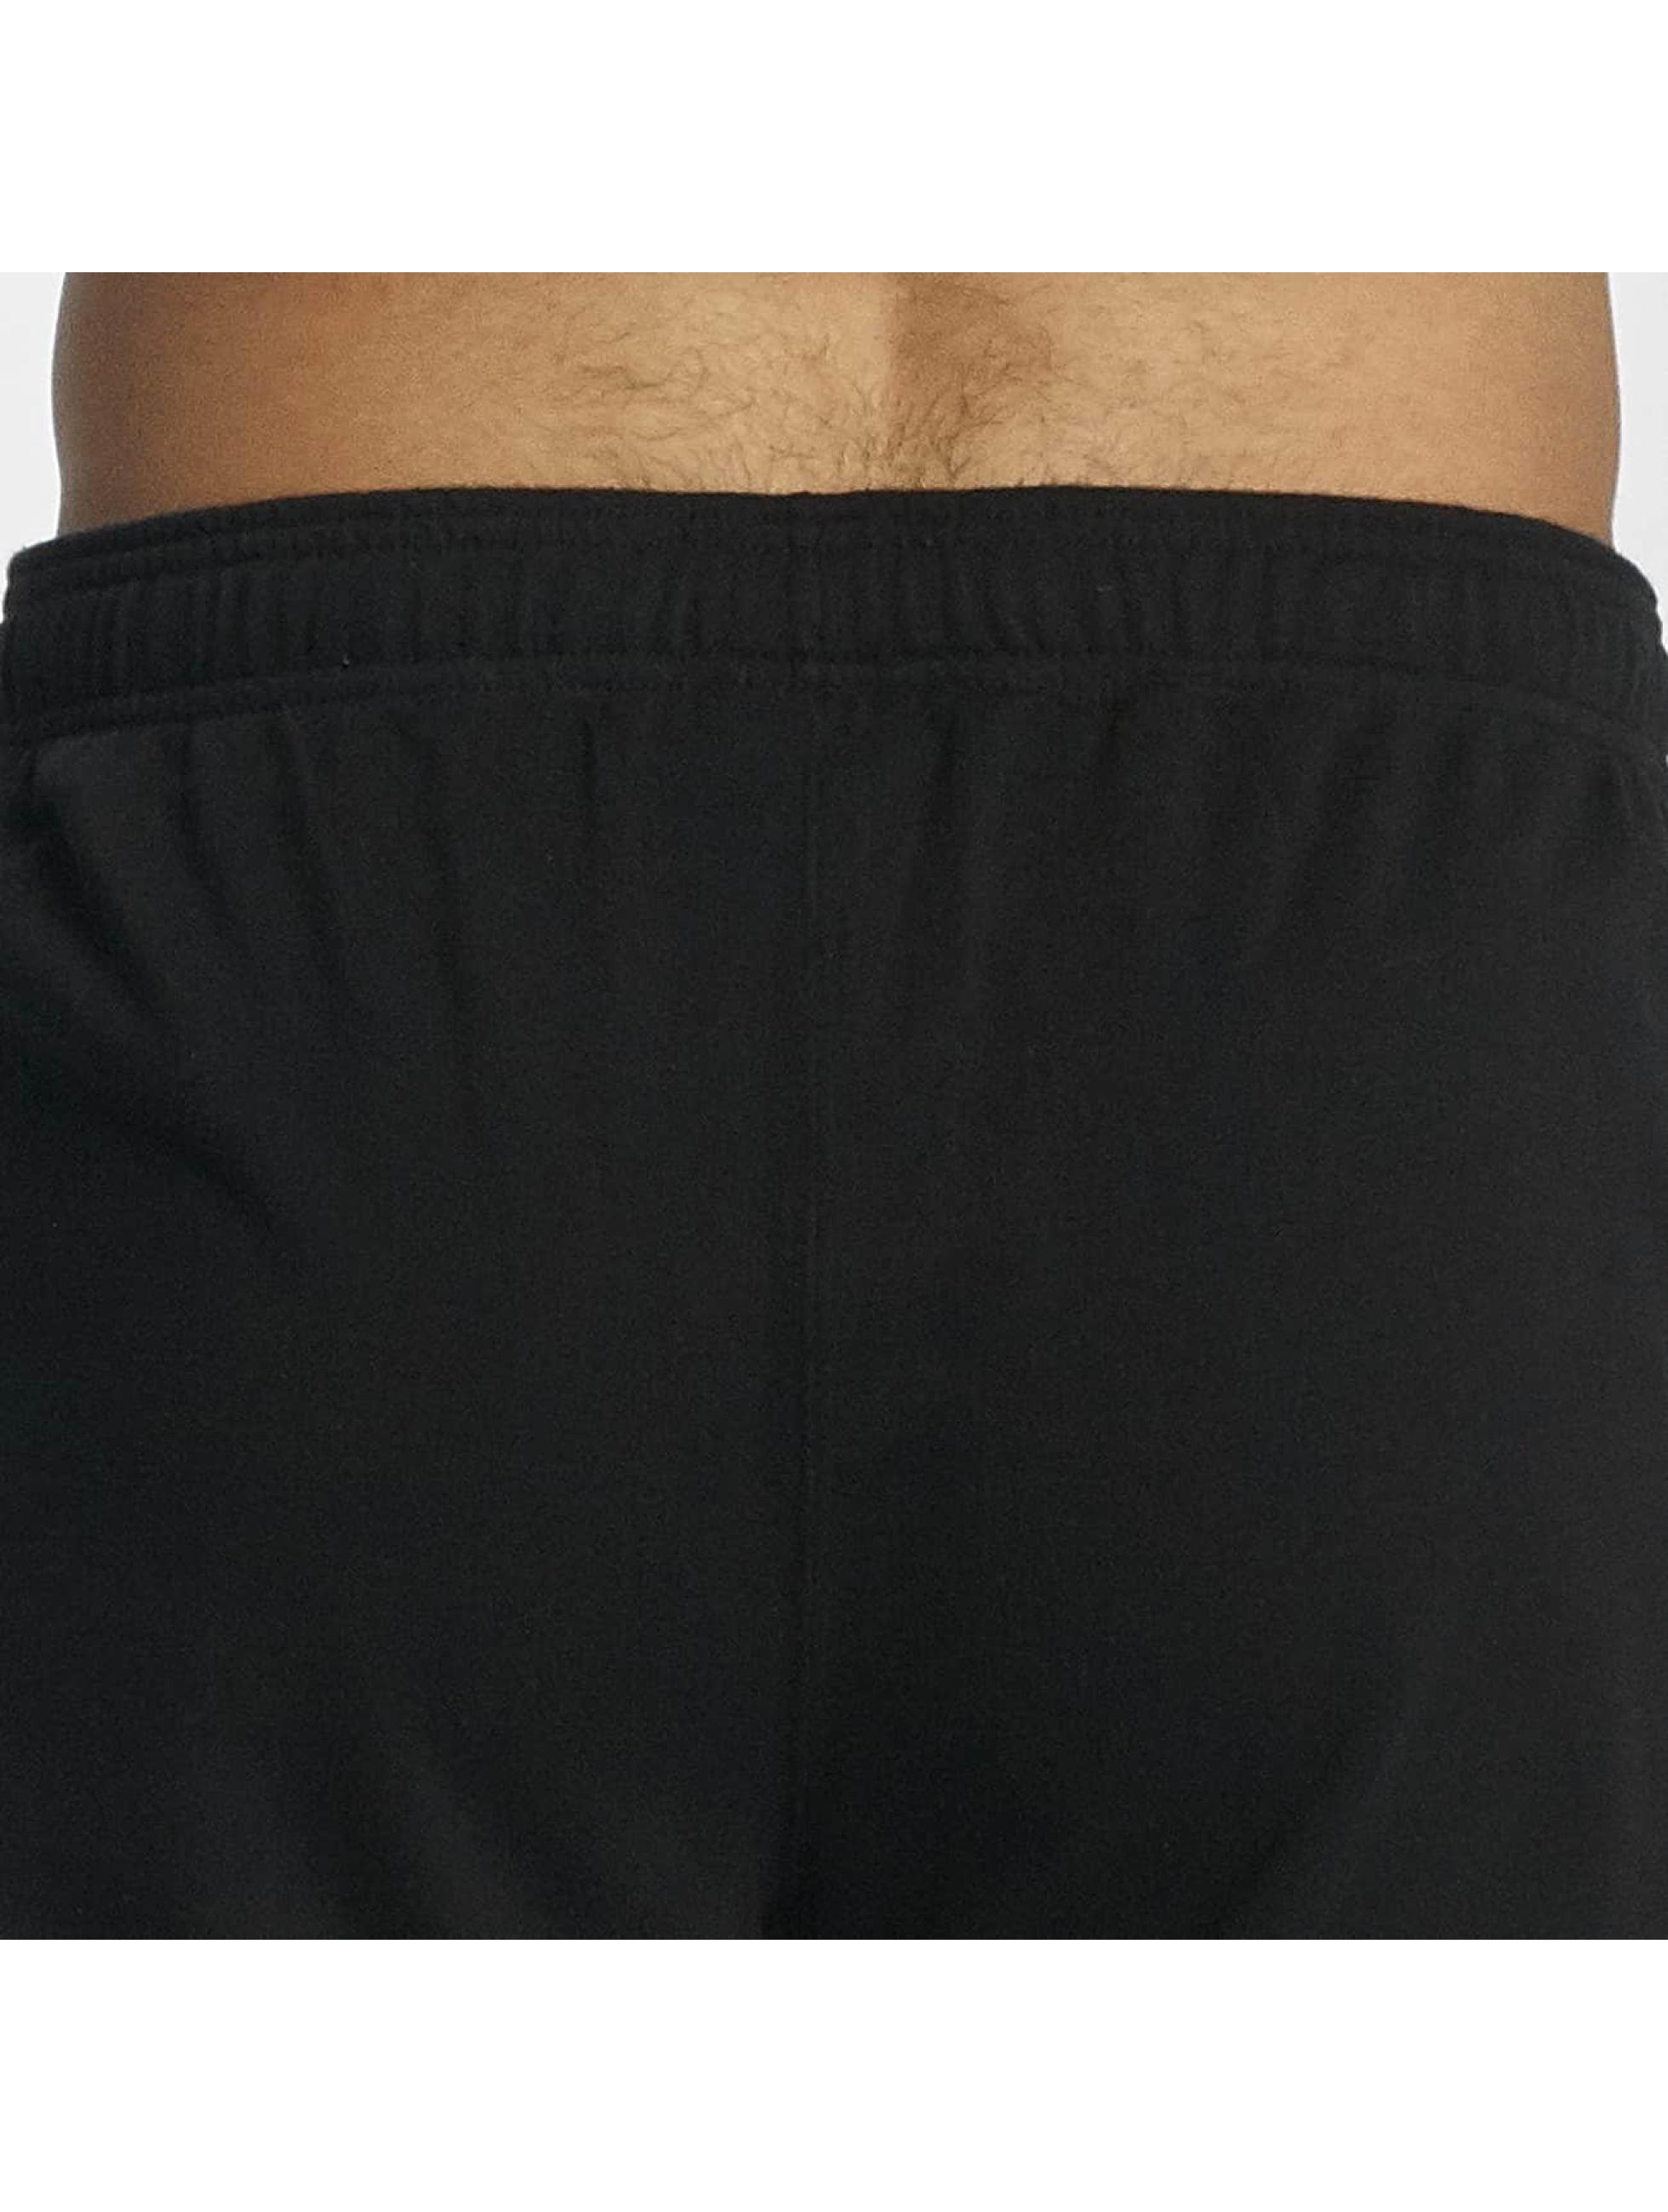 Champion Athletics Suits Apparel black